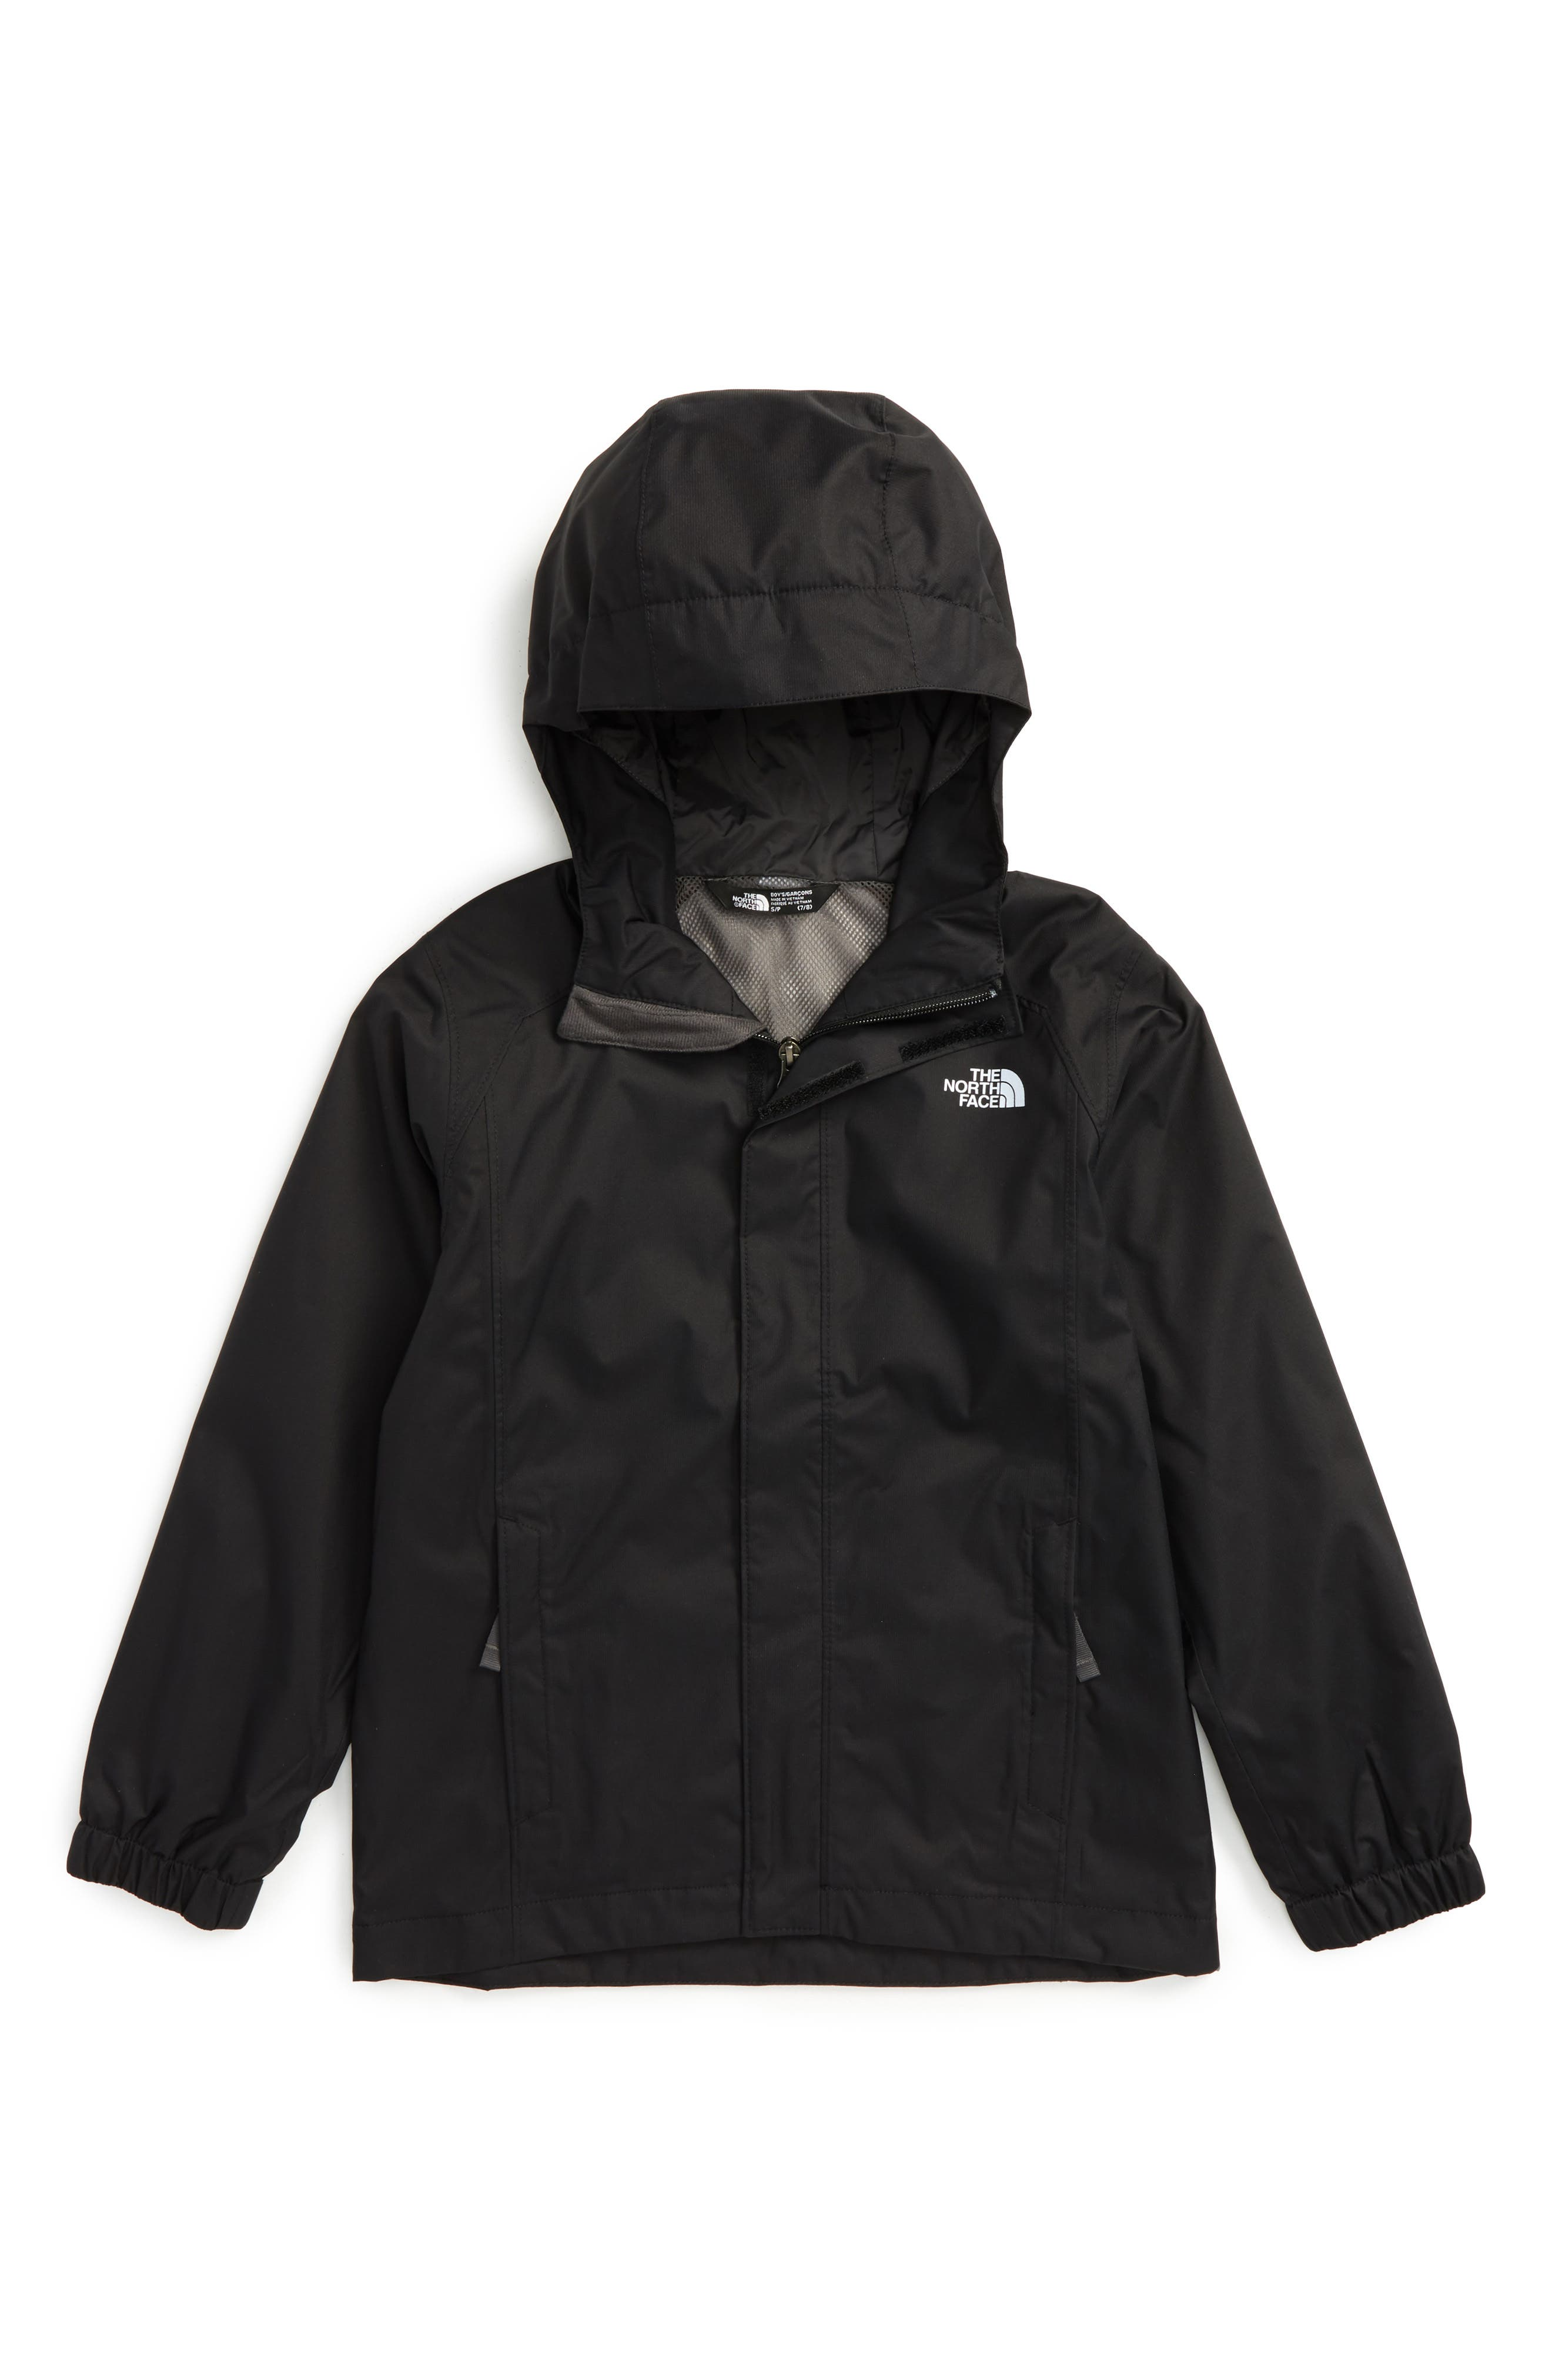 'Resolve' Waterproof Jacket,                             Main thumbnail 1, color,                             5 Tnf Black